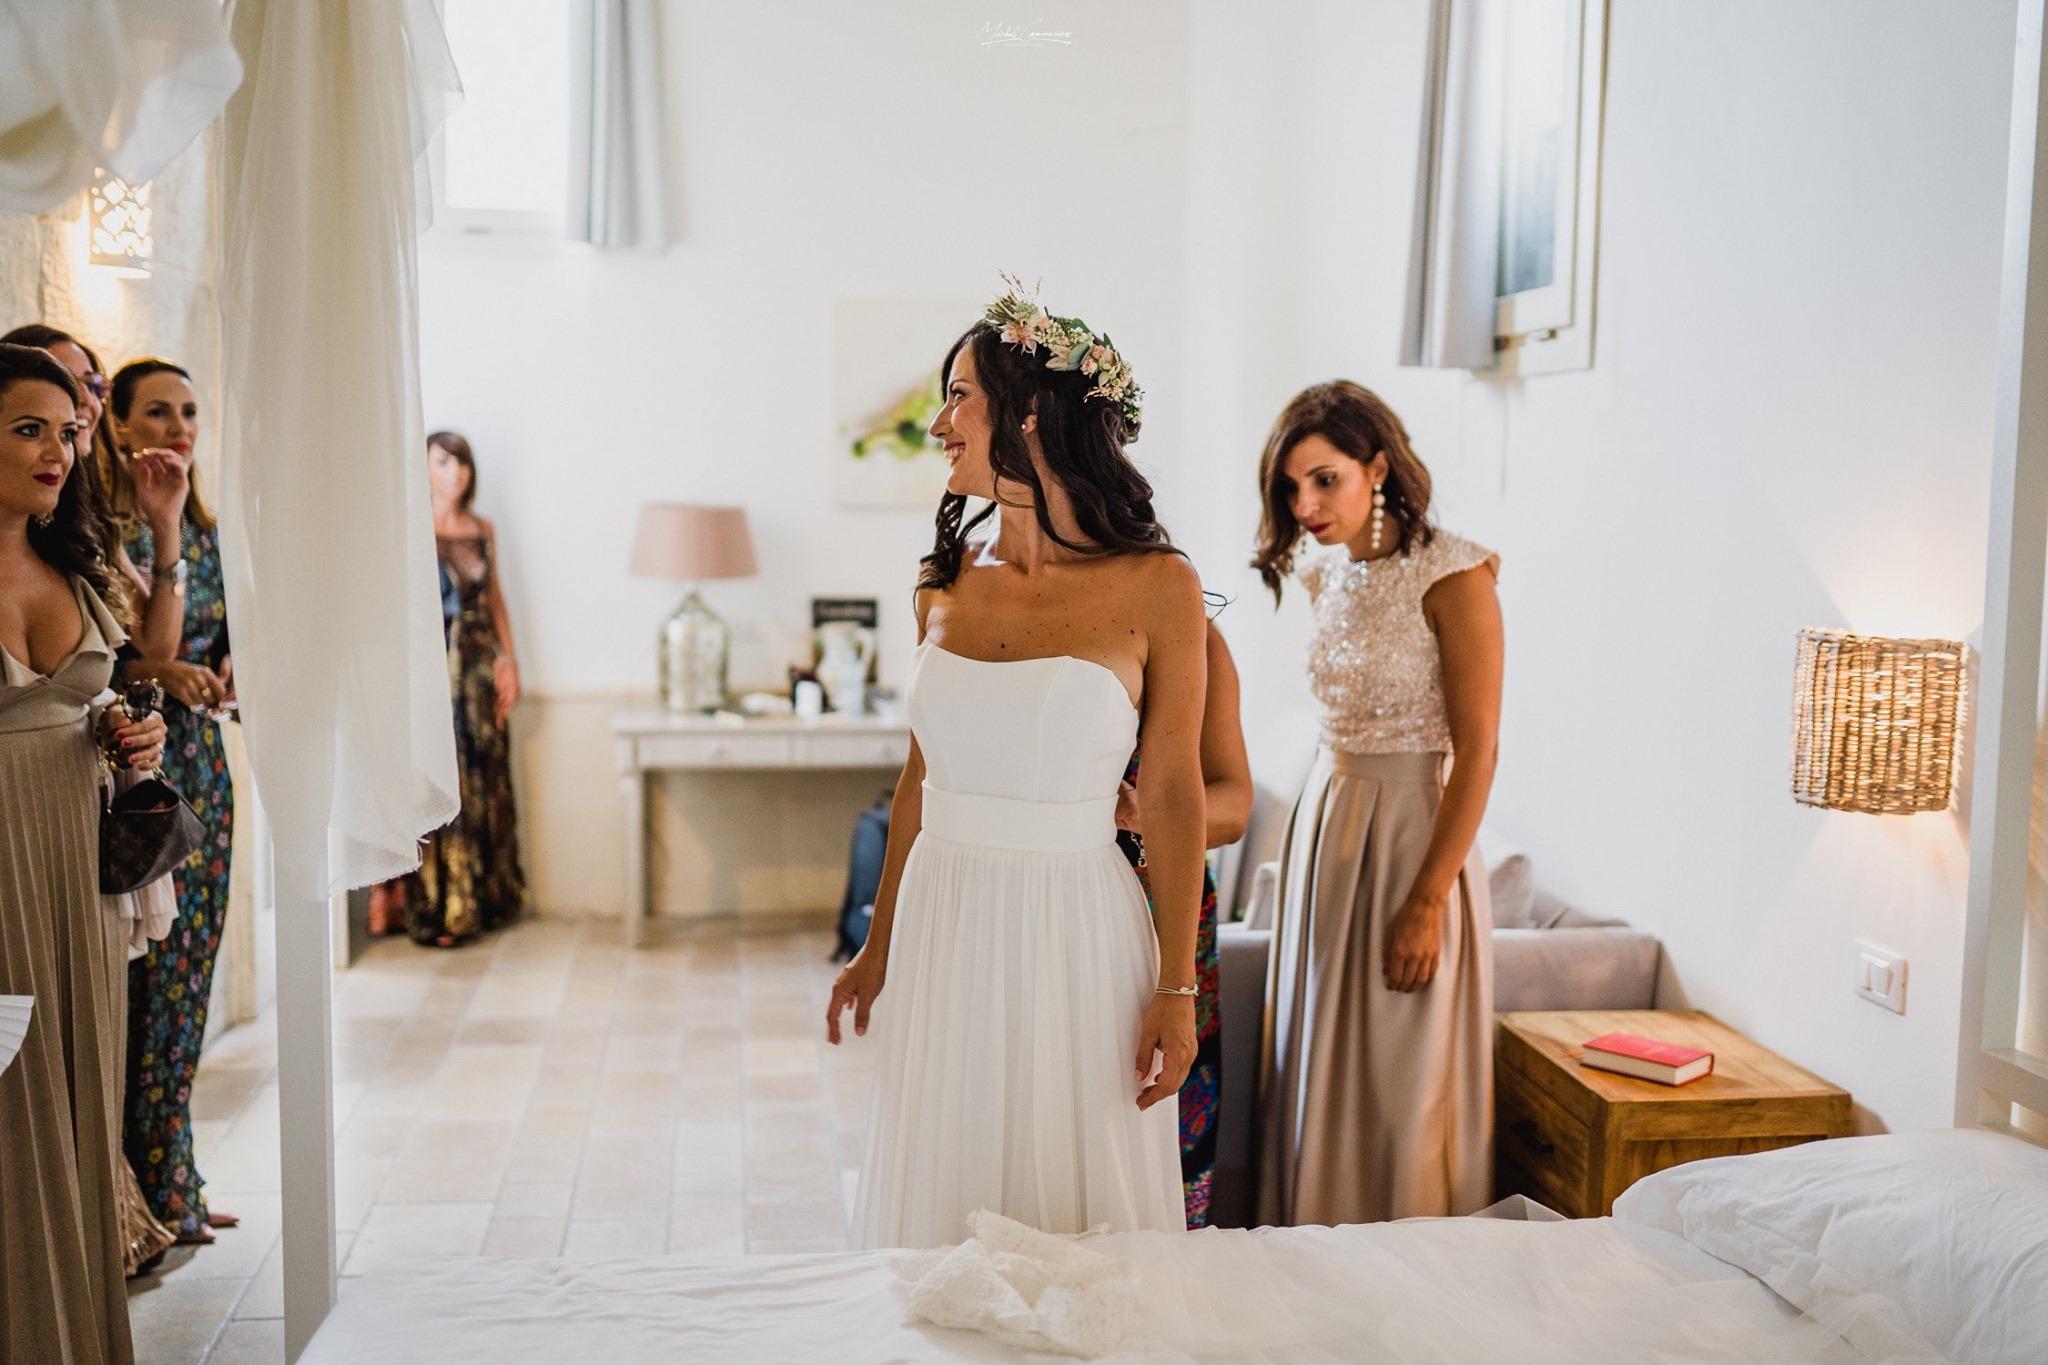 Getting married in Puglia